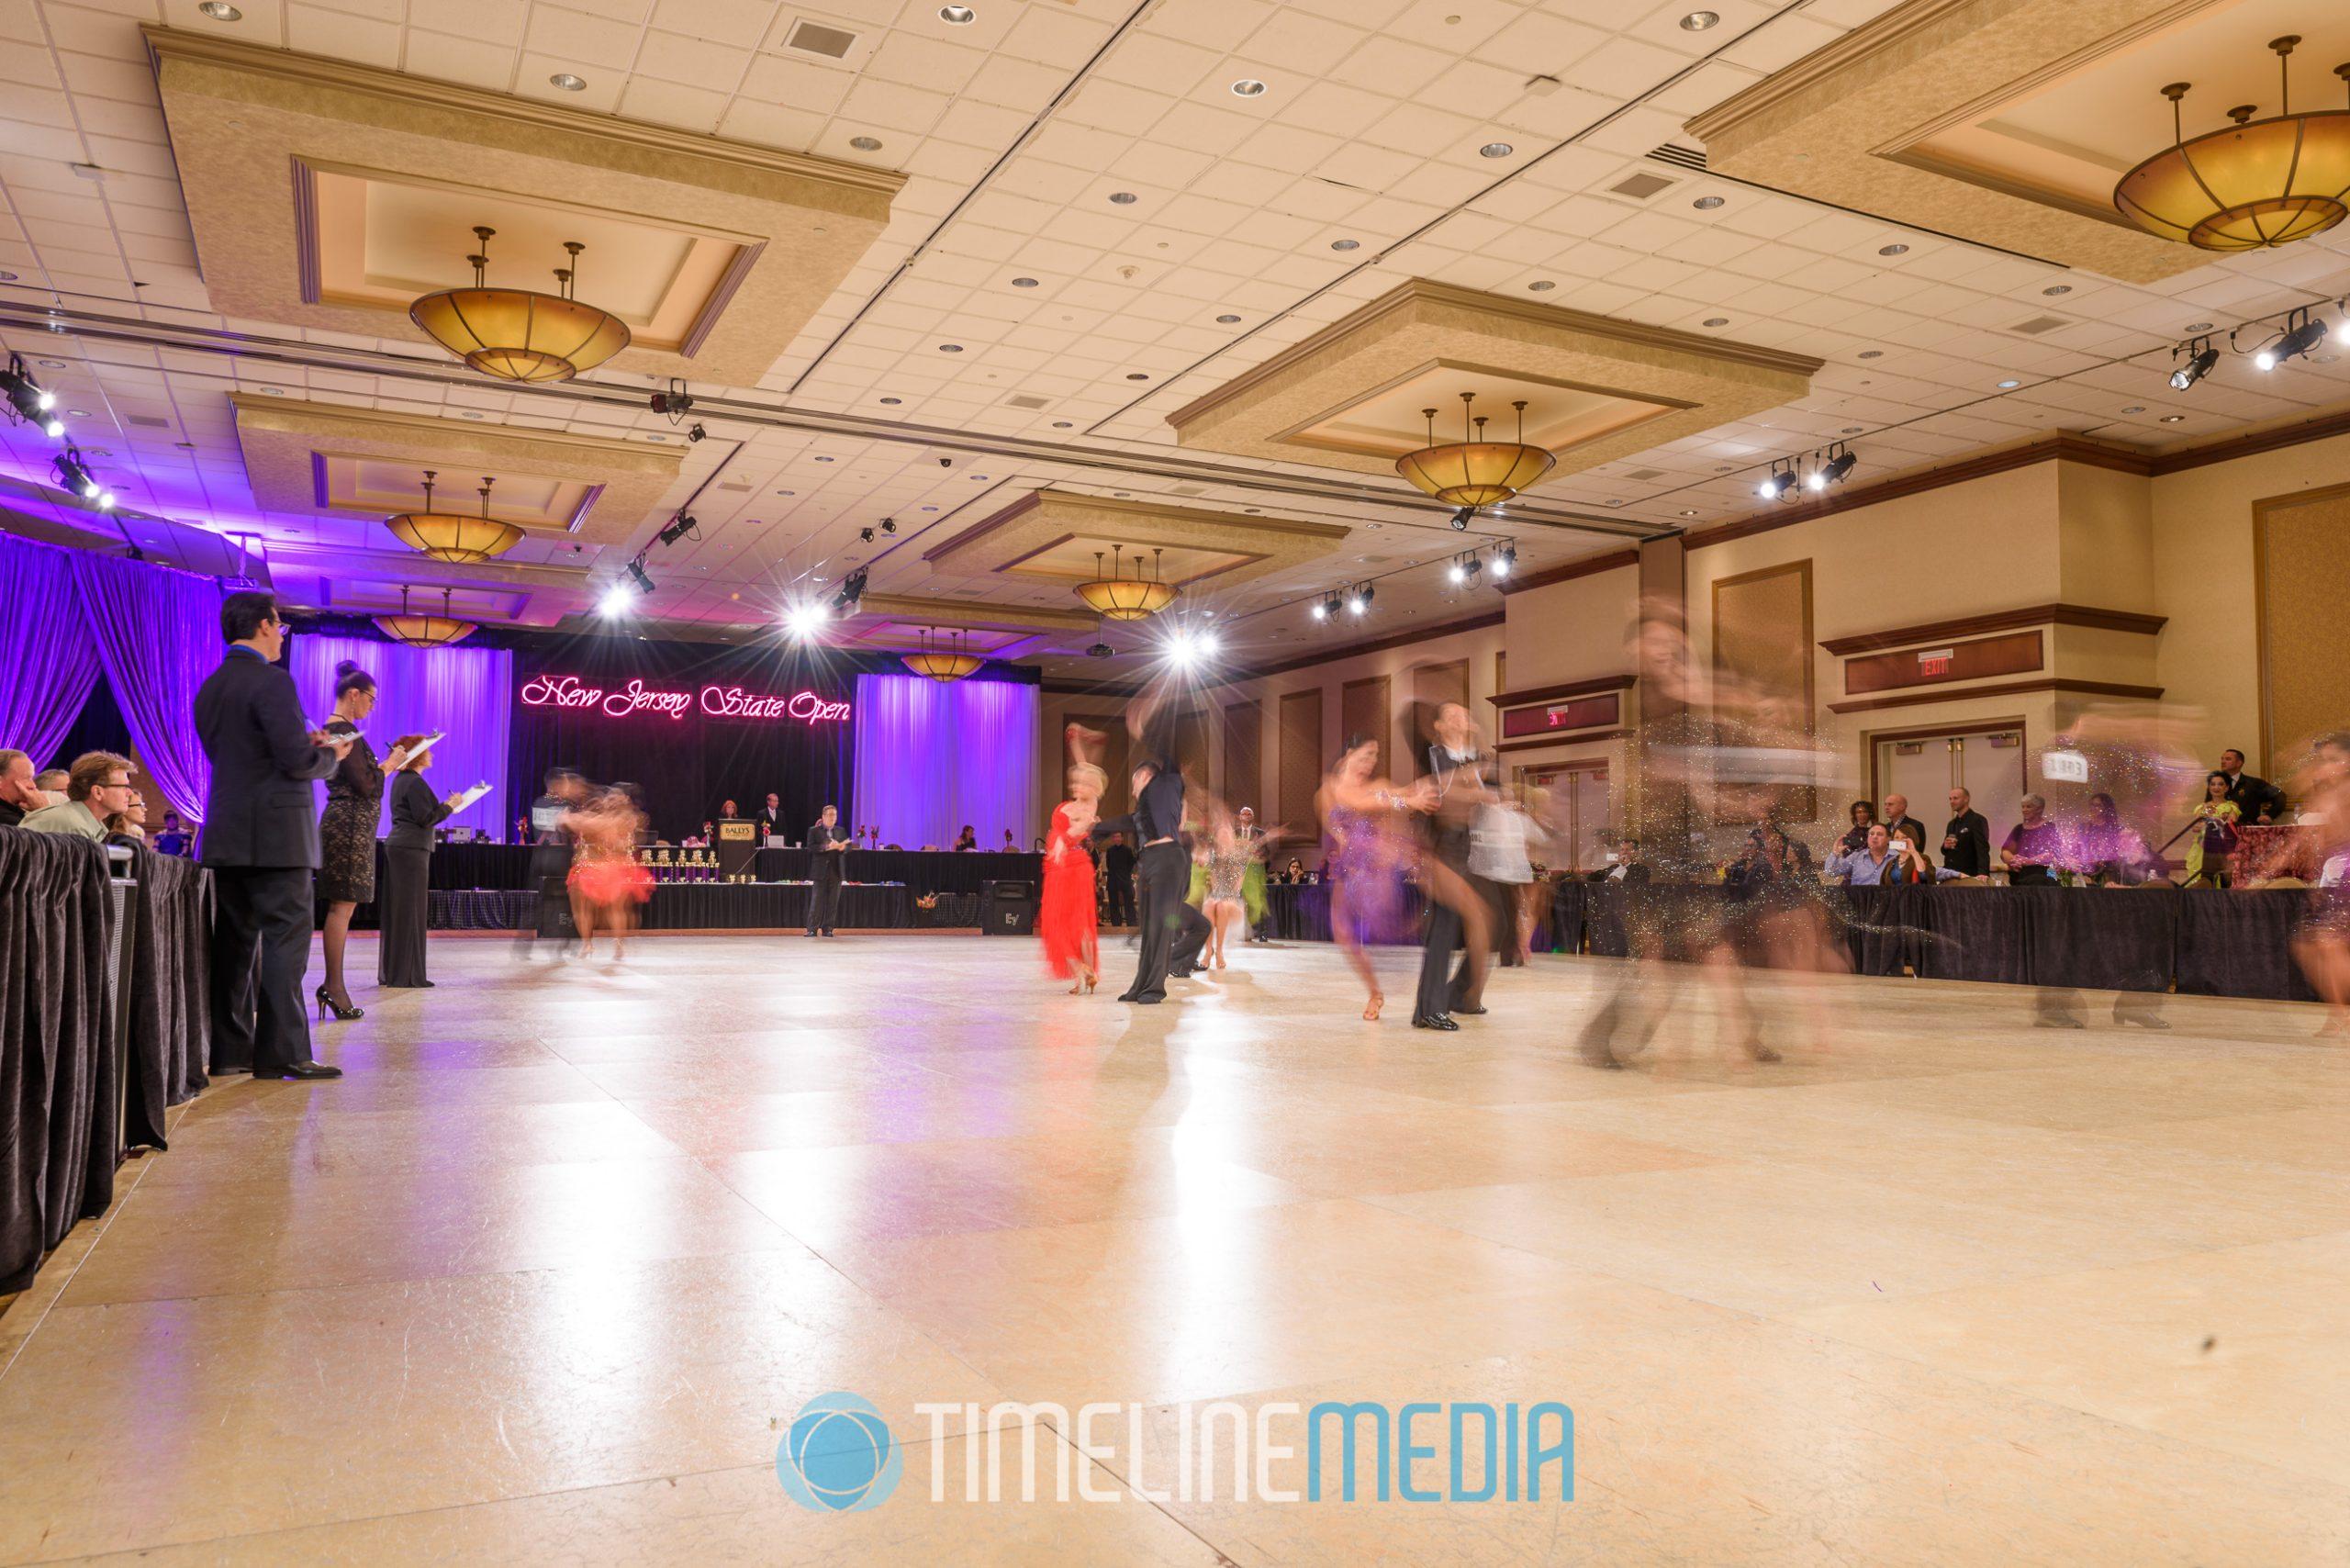 Competition dance floor Bally's Atlantic City ©TimeLine Media